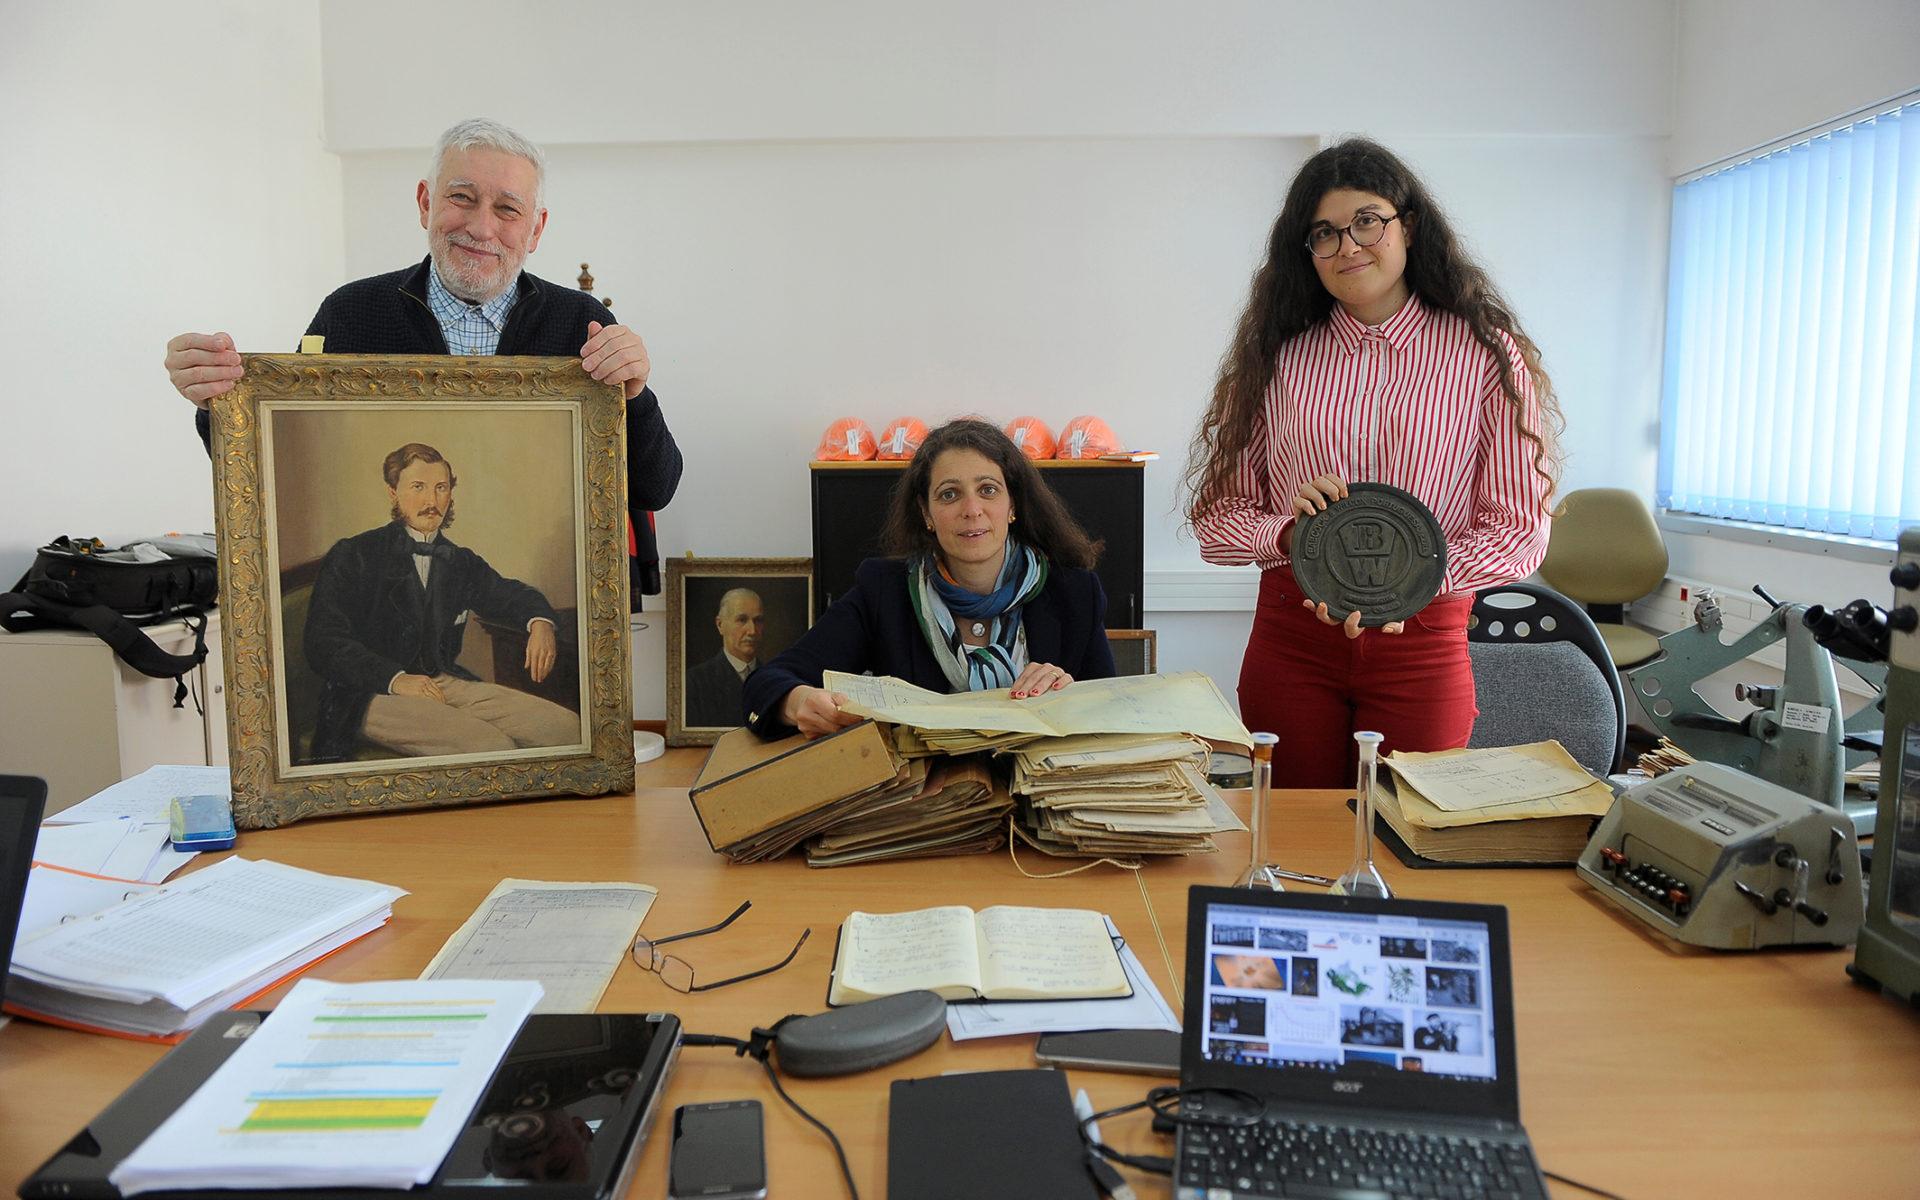 Jorge Custódio, Sofia Costa Macedo and Susana Pacheco, the team of industrial archeologists who analyzed the history of Caima